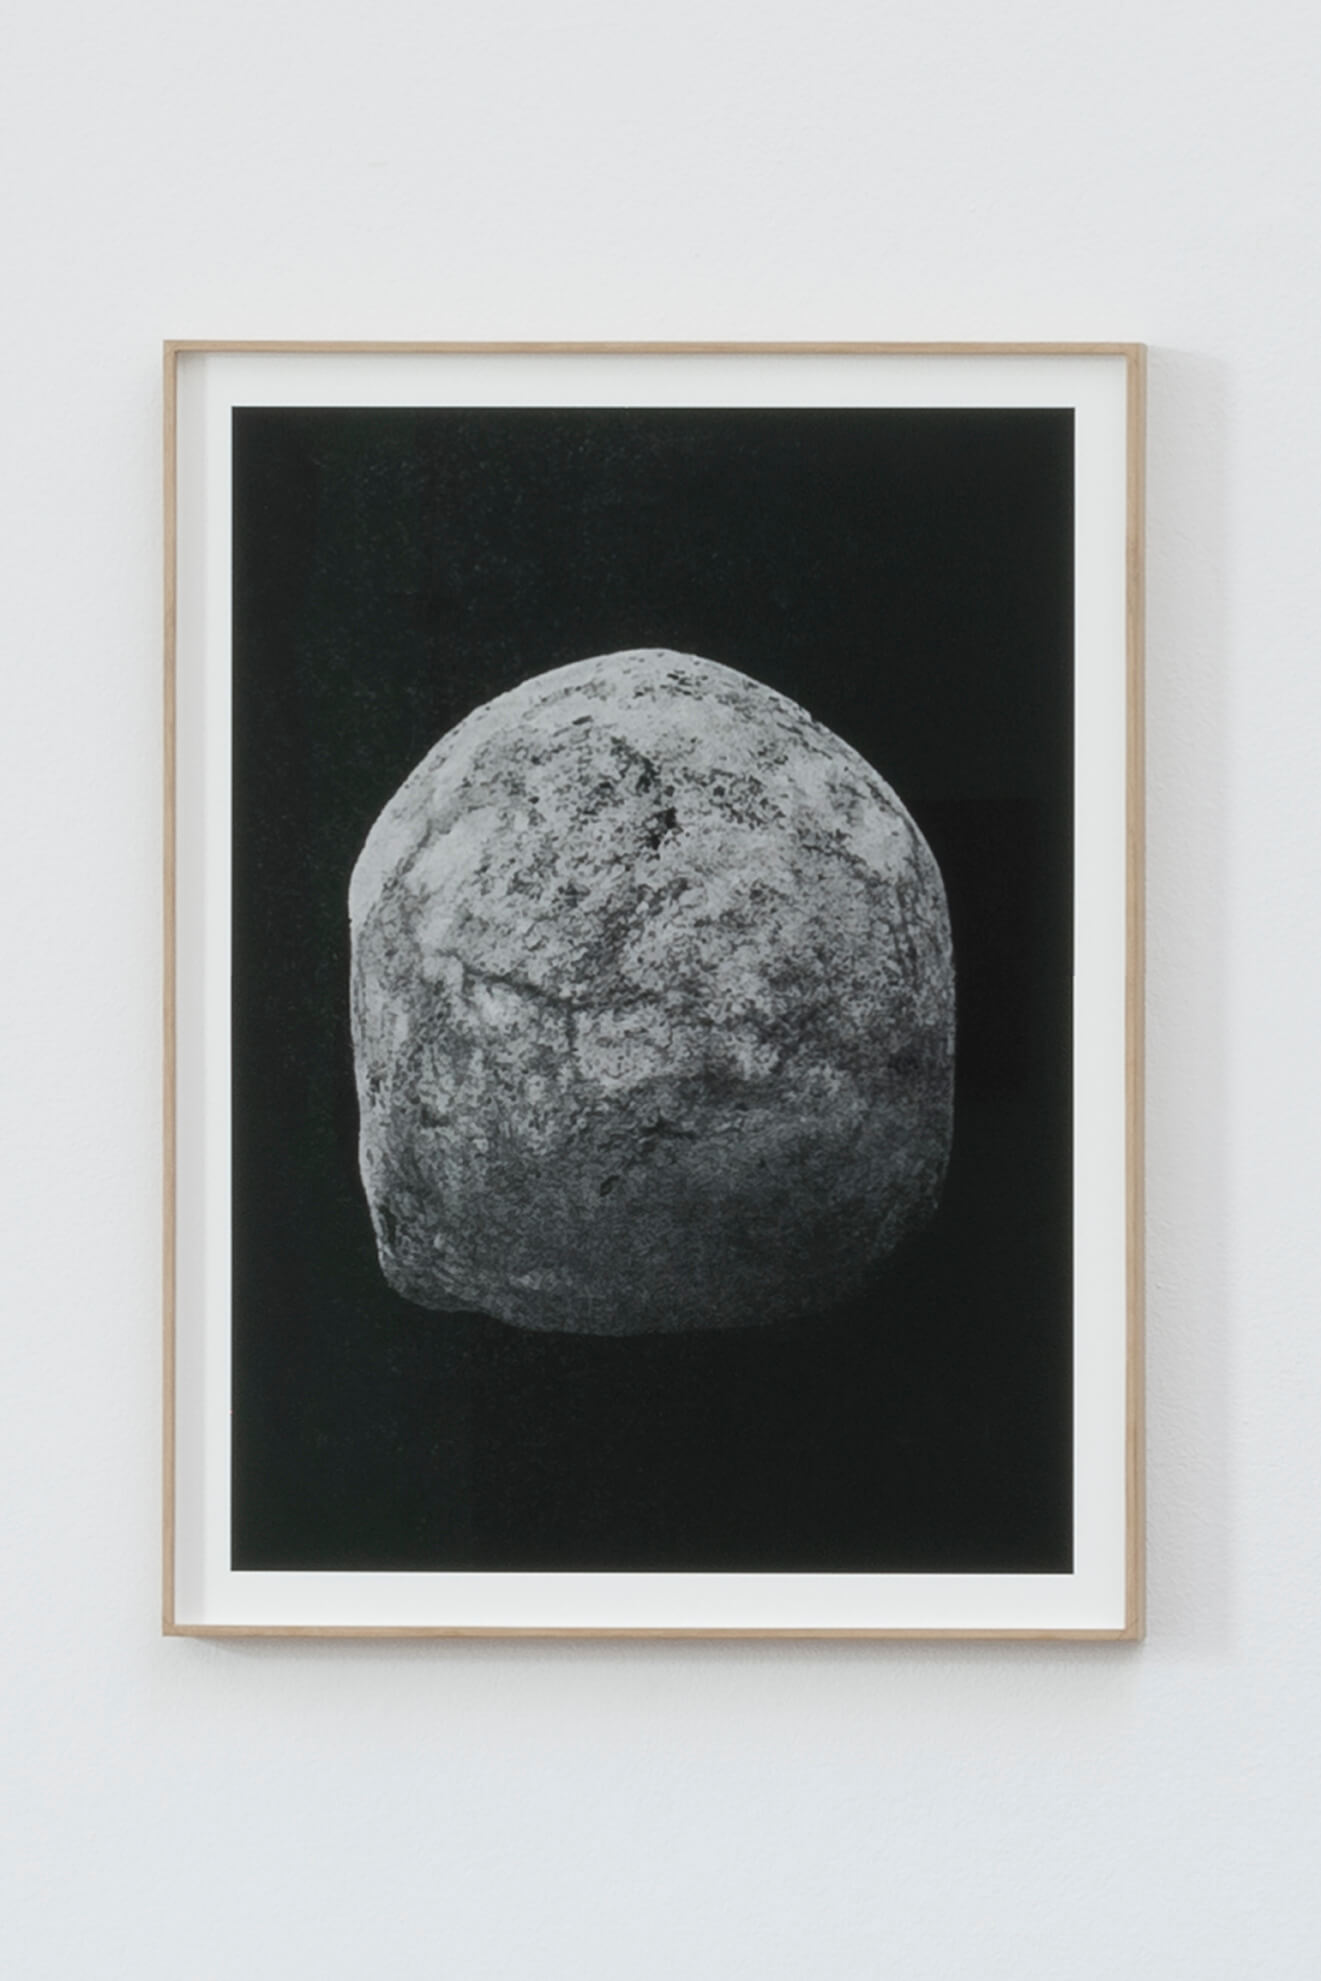 PETER PILLER.HOE 01, 2019 | El Museu Imaginari / El Museo Imaginario / The Imaginary Museum | ProjecteSD